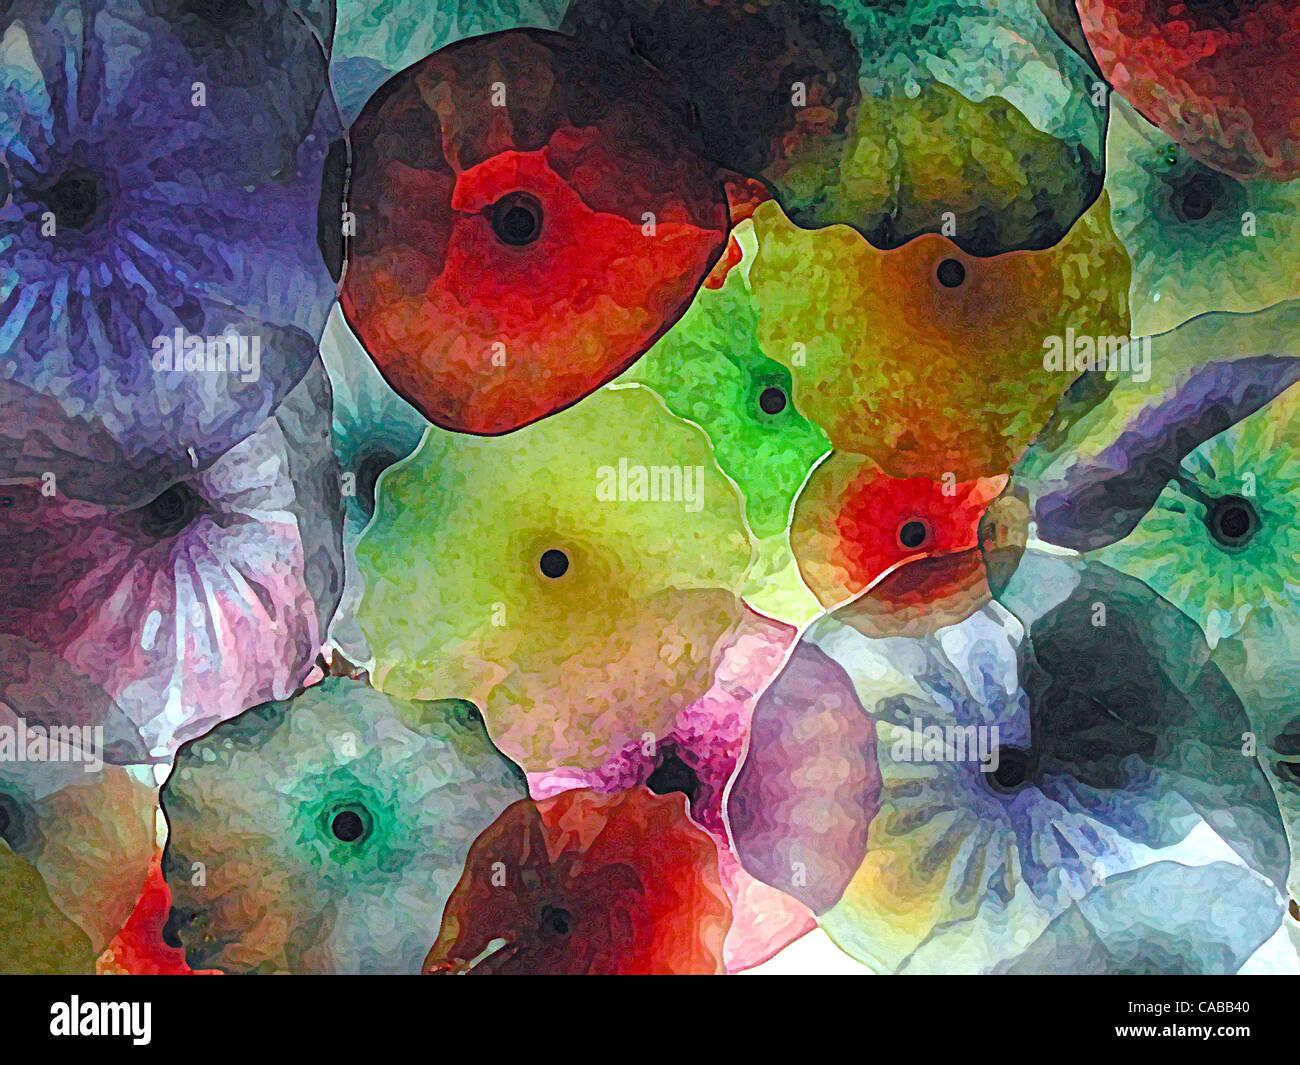 3. Juni 2004; Los Angeles, Kalifornien, USA; Abstrakte Glasblumen. Stockfoto